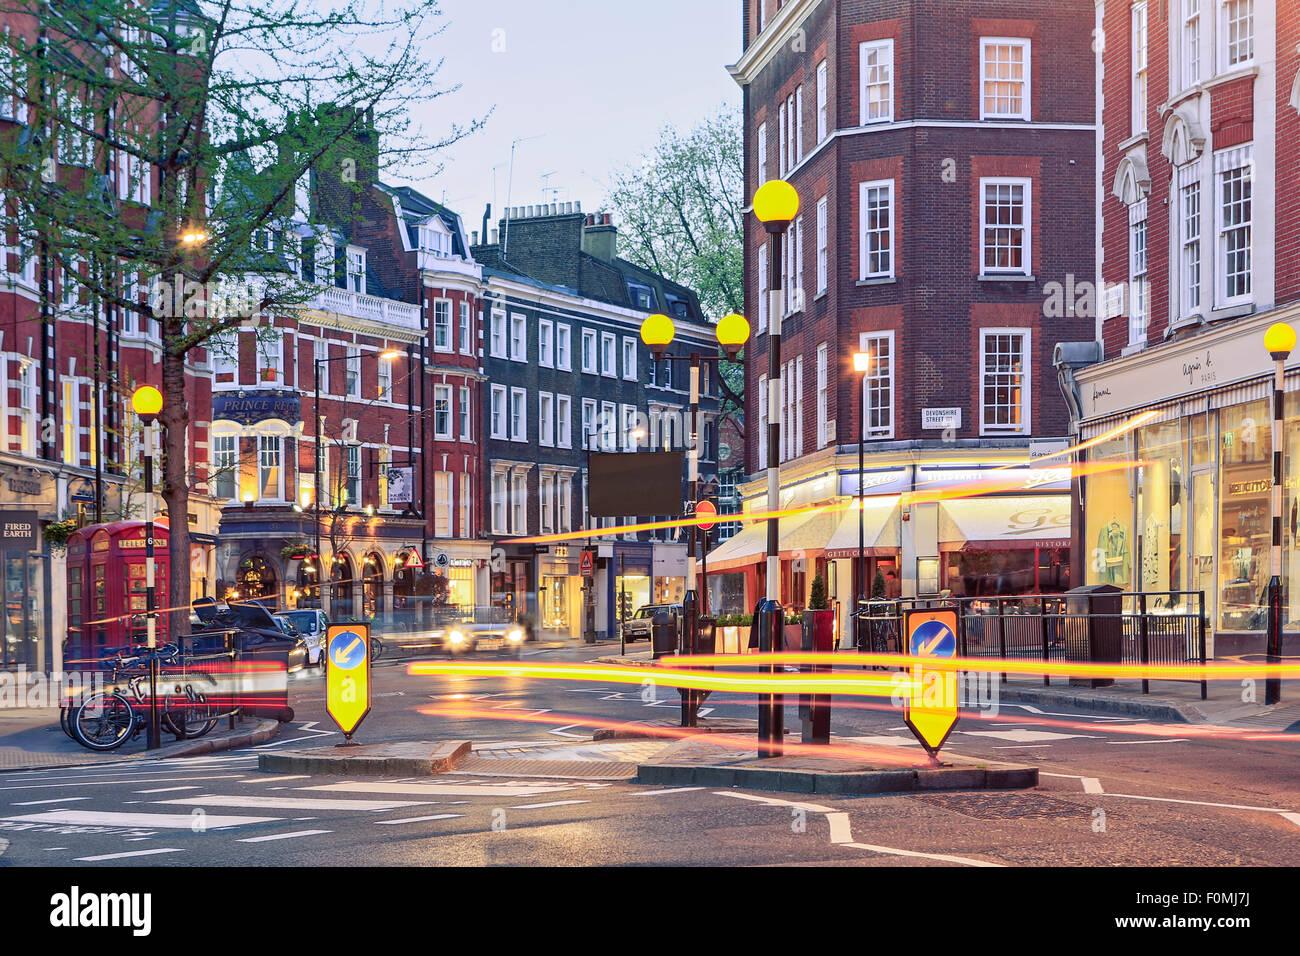 Marylebone High Street, London. - Stock Image